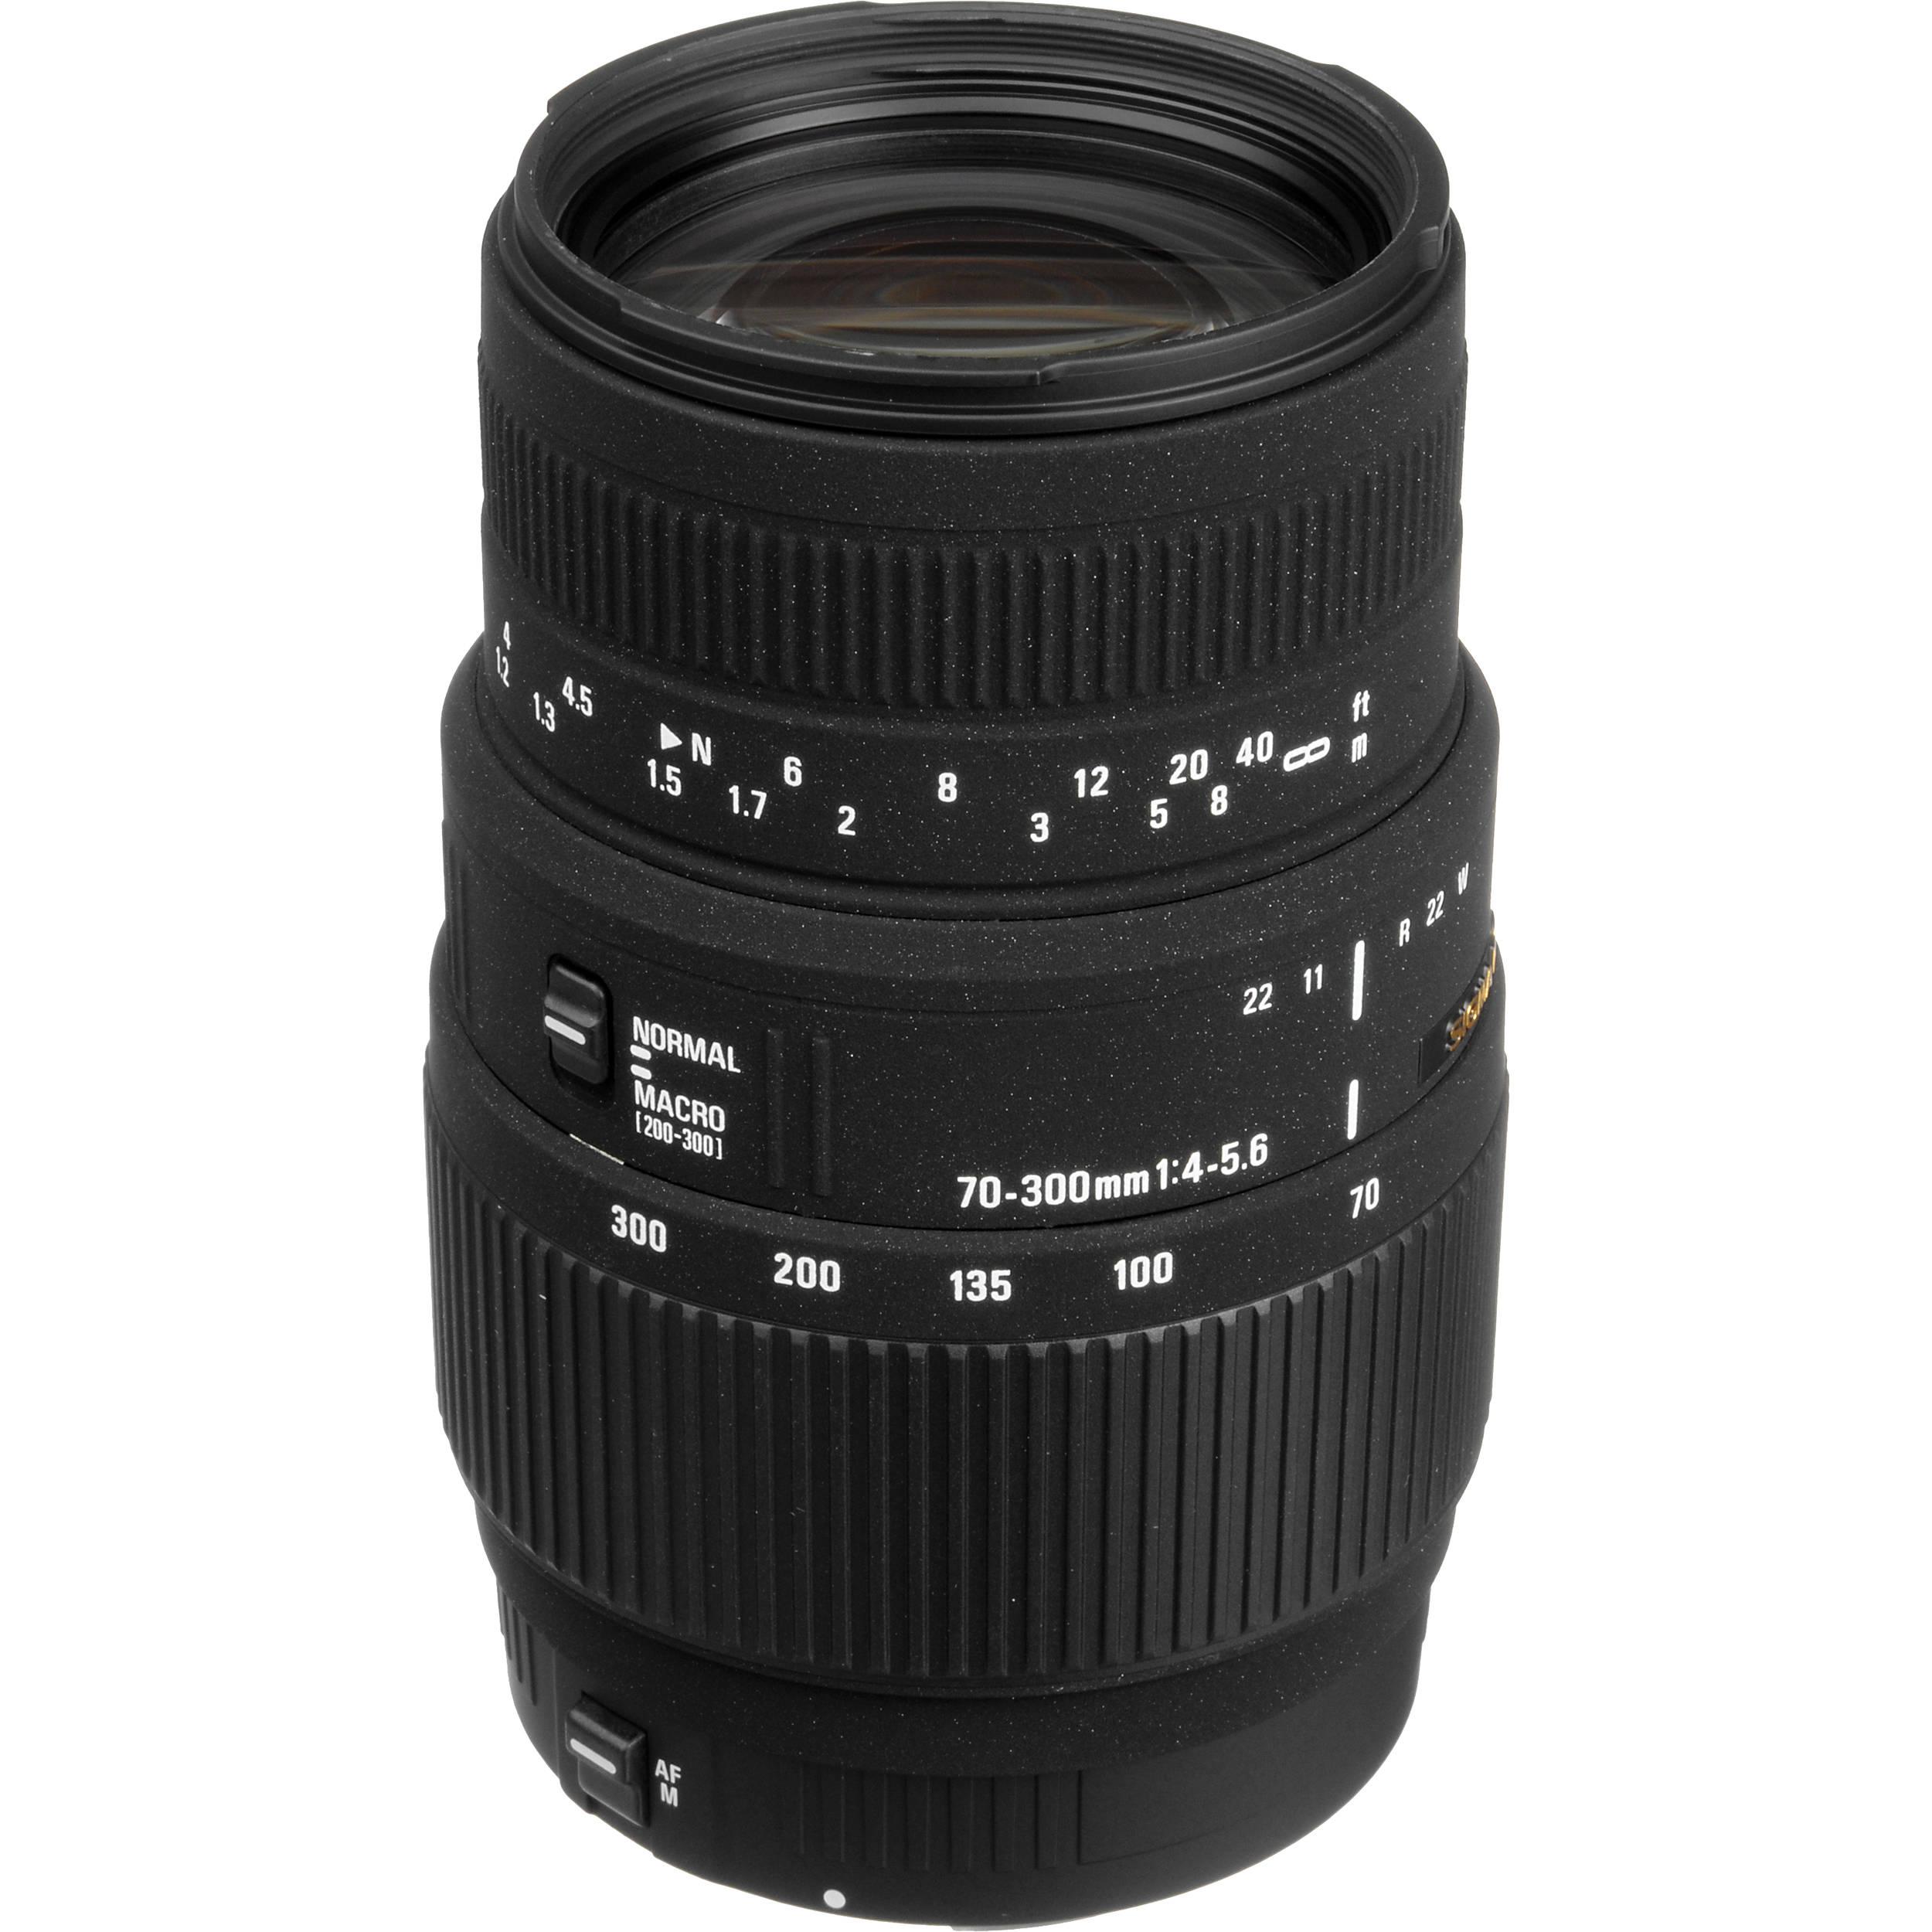 Sigma 70-300mm f/4-5.6 DG Macro Lens for Canon EOS 509101 B&H